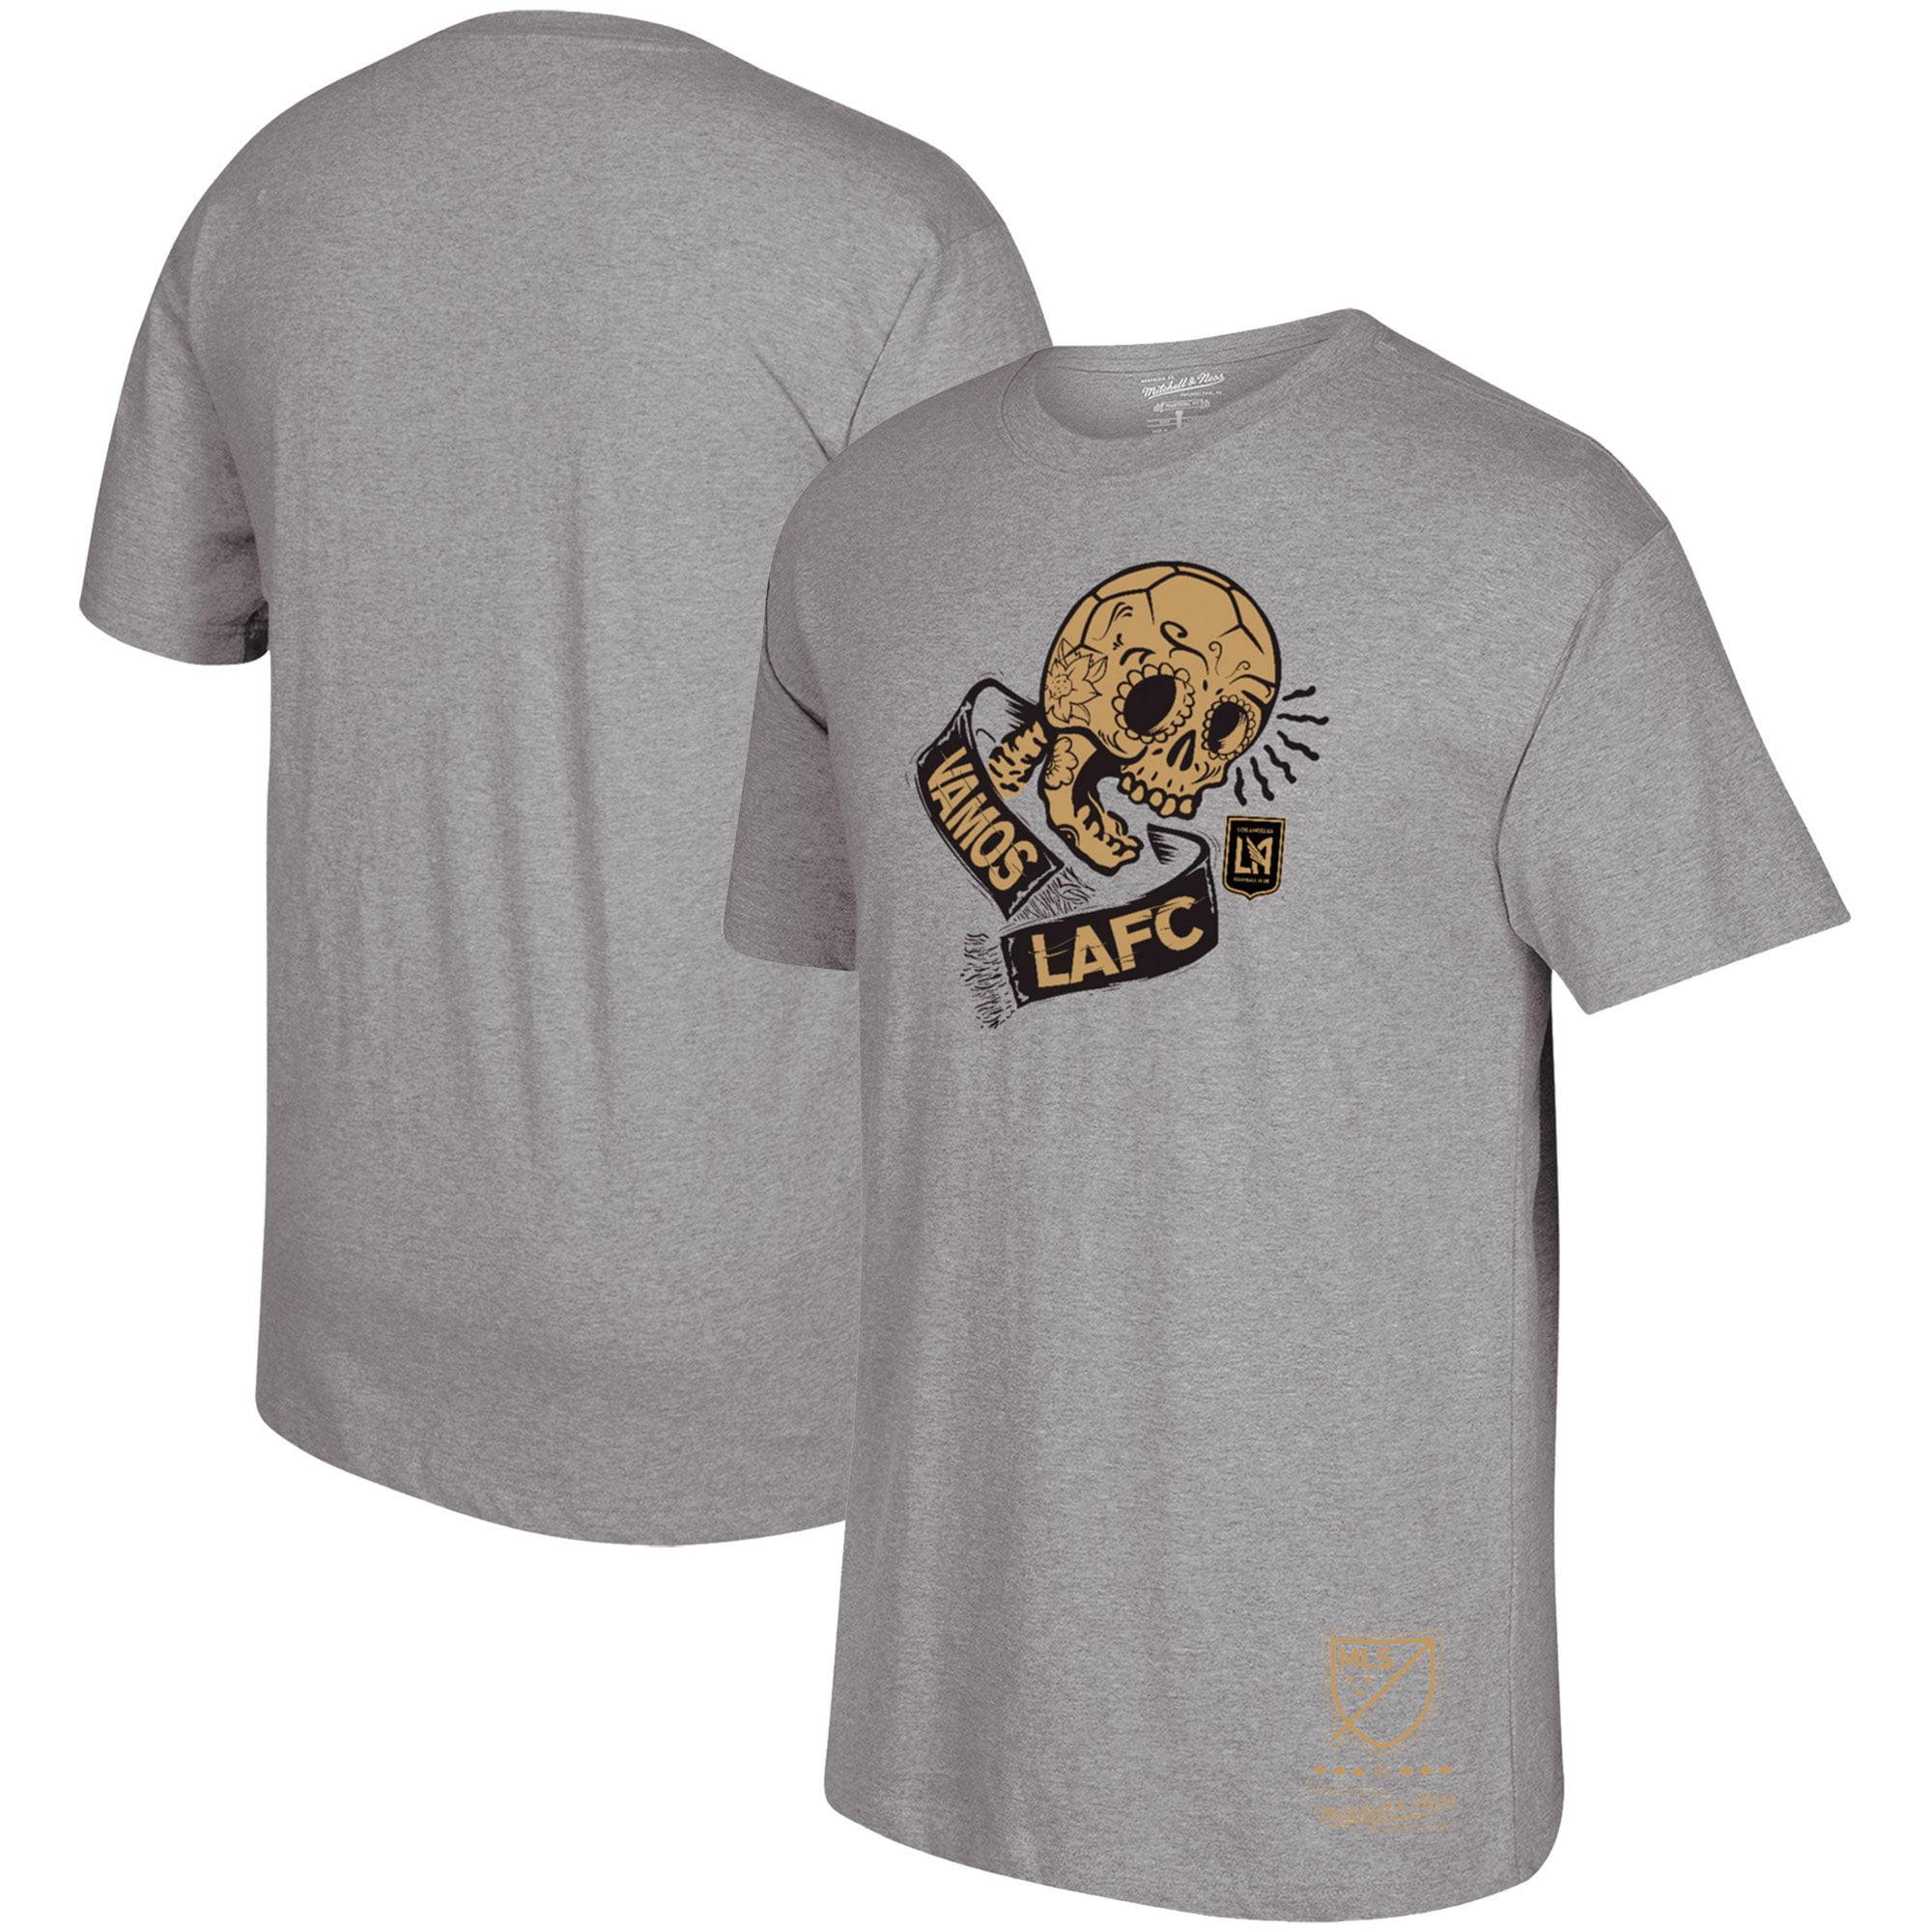 LAFC Mitchell & Ness Vamos T-Shirt - Heathered Gray